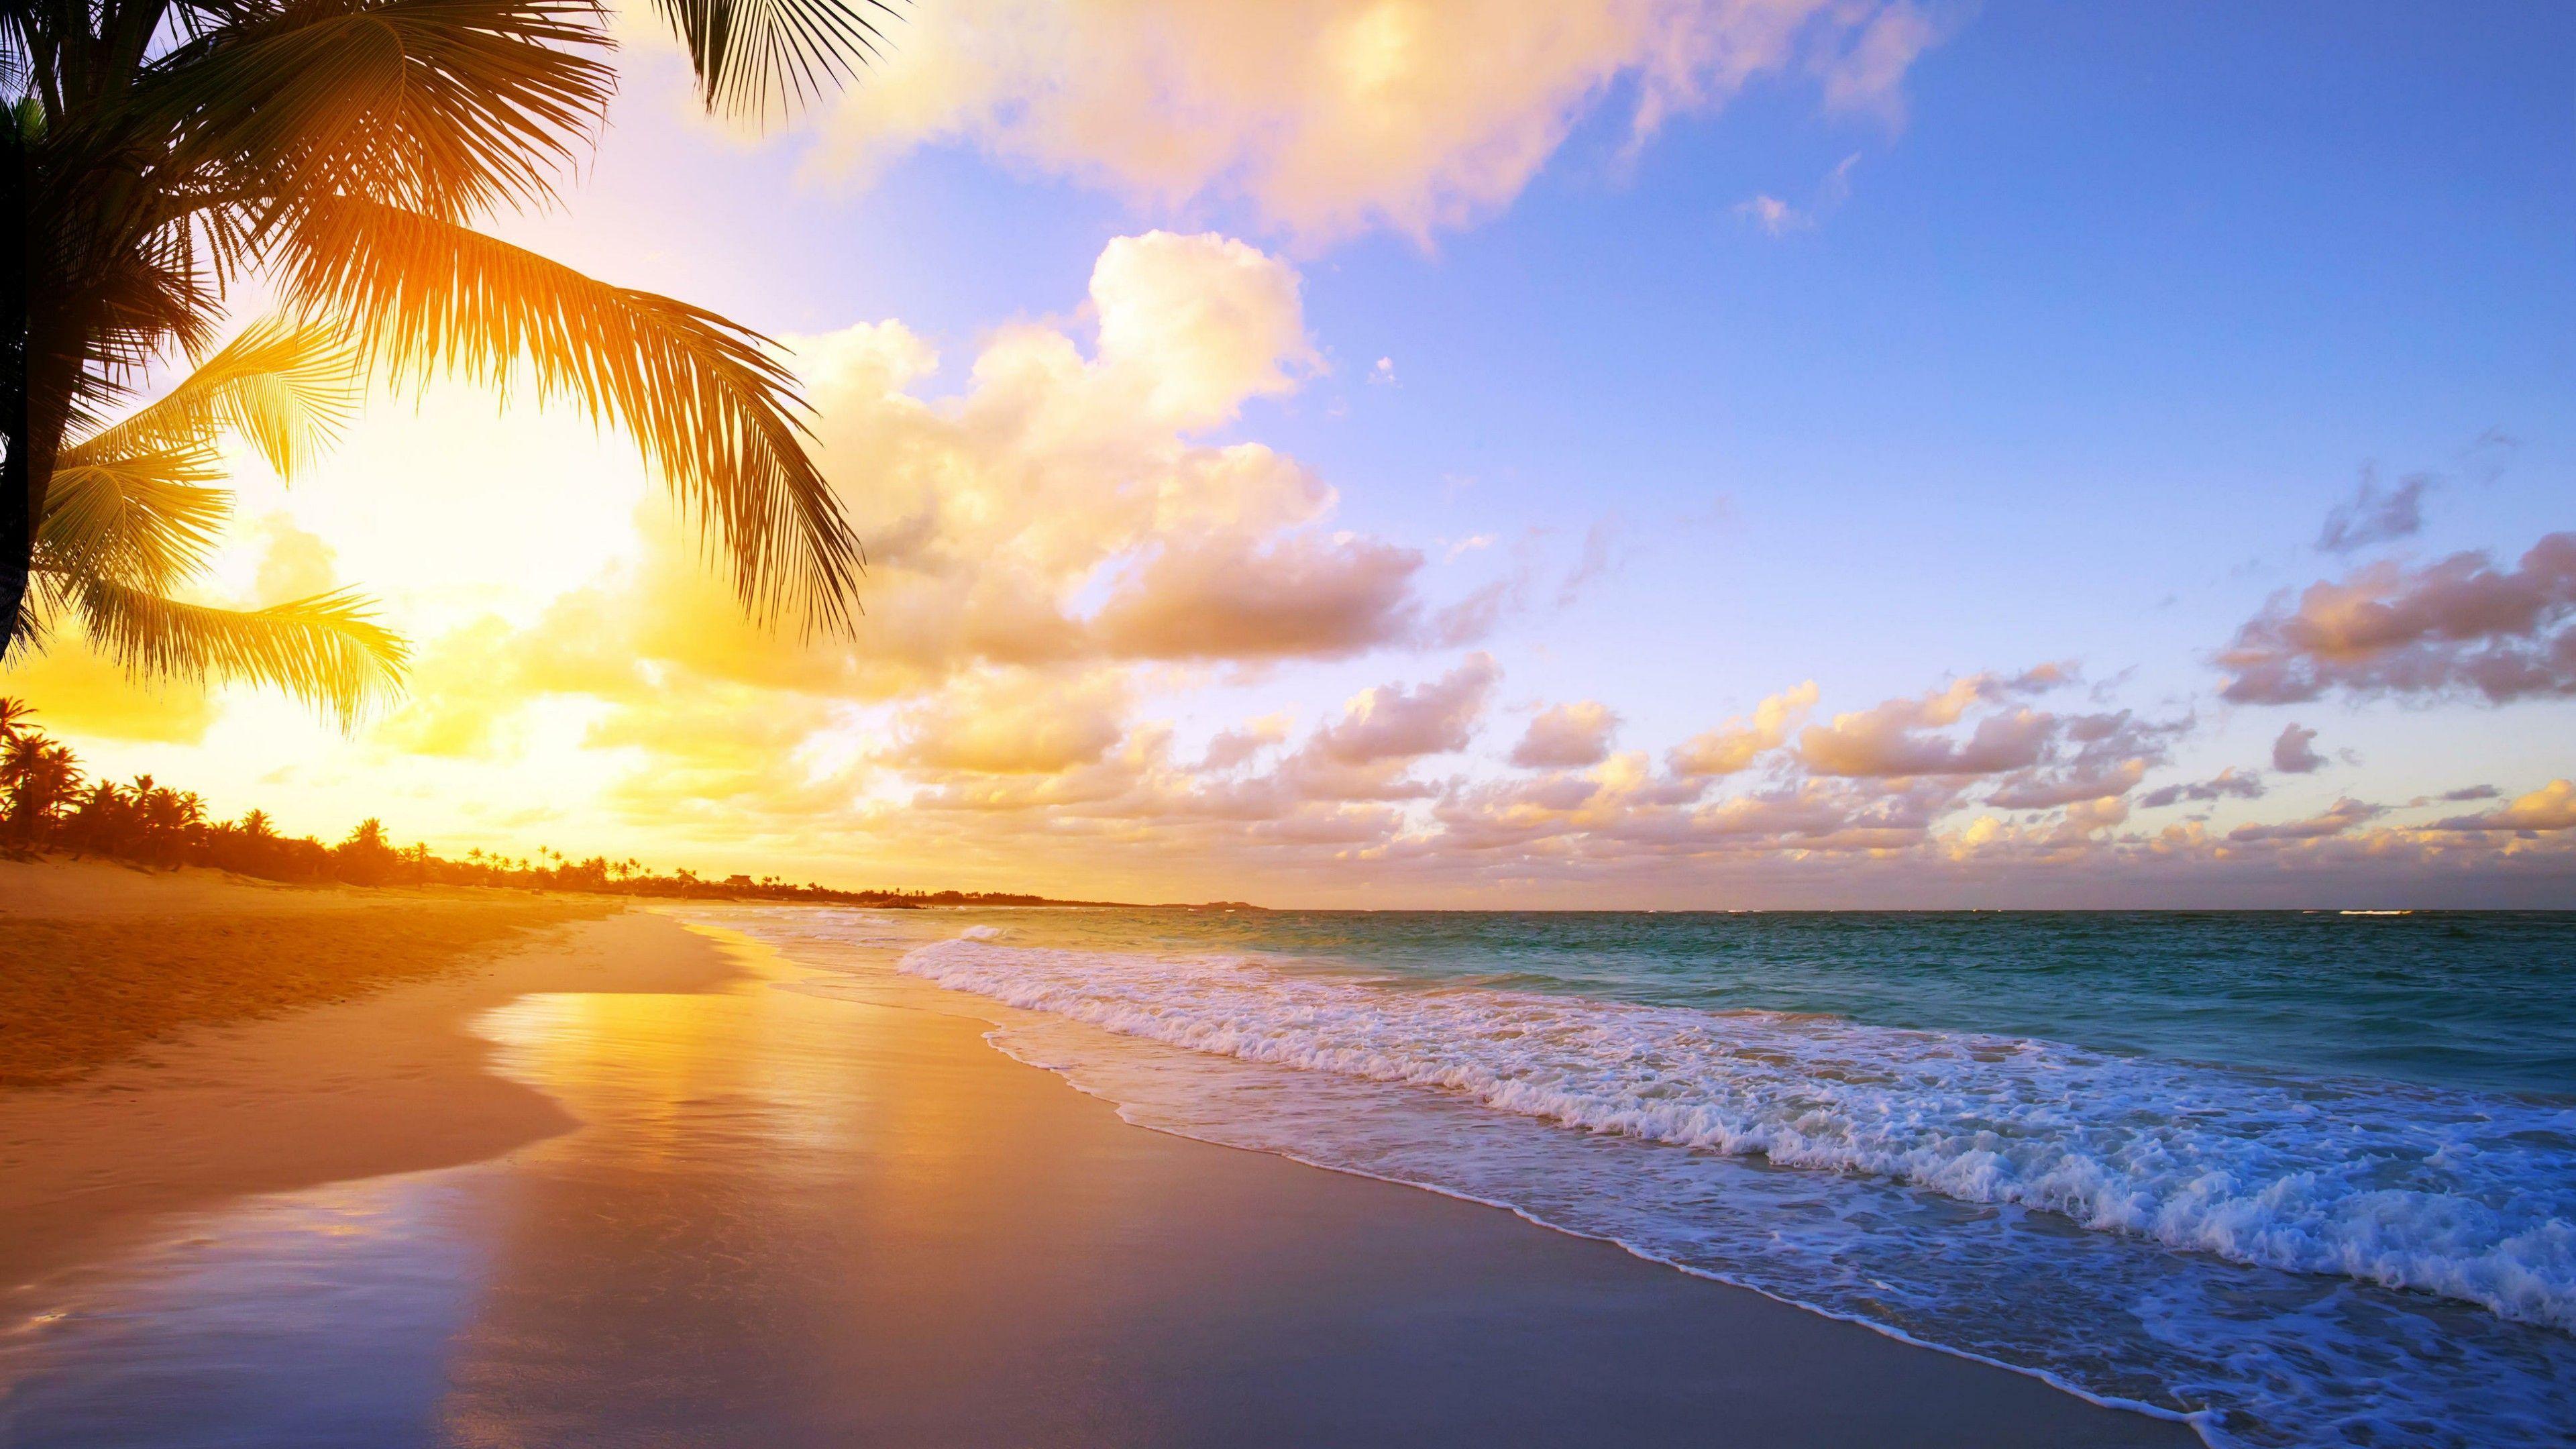 Beach Sunrise Wallpapers Top Free Beach Sunrise Backgrounds Wallpaperaccess